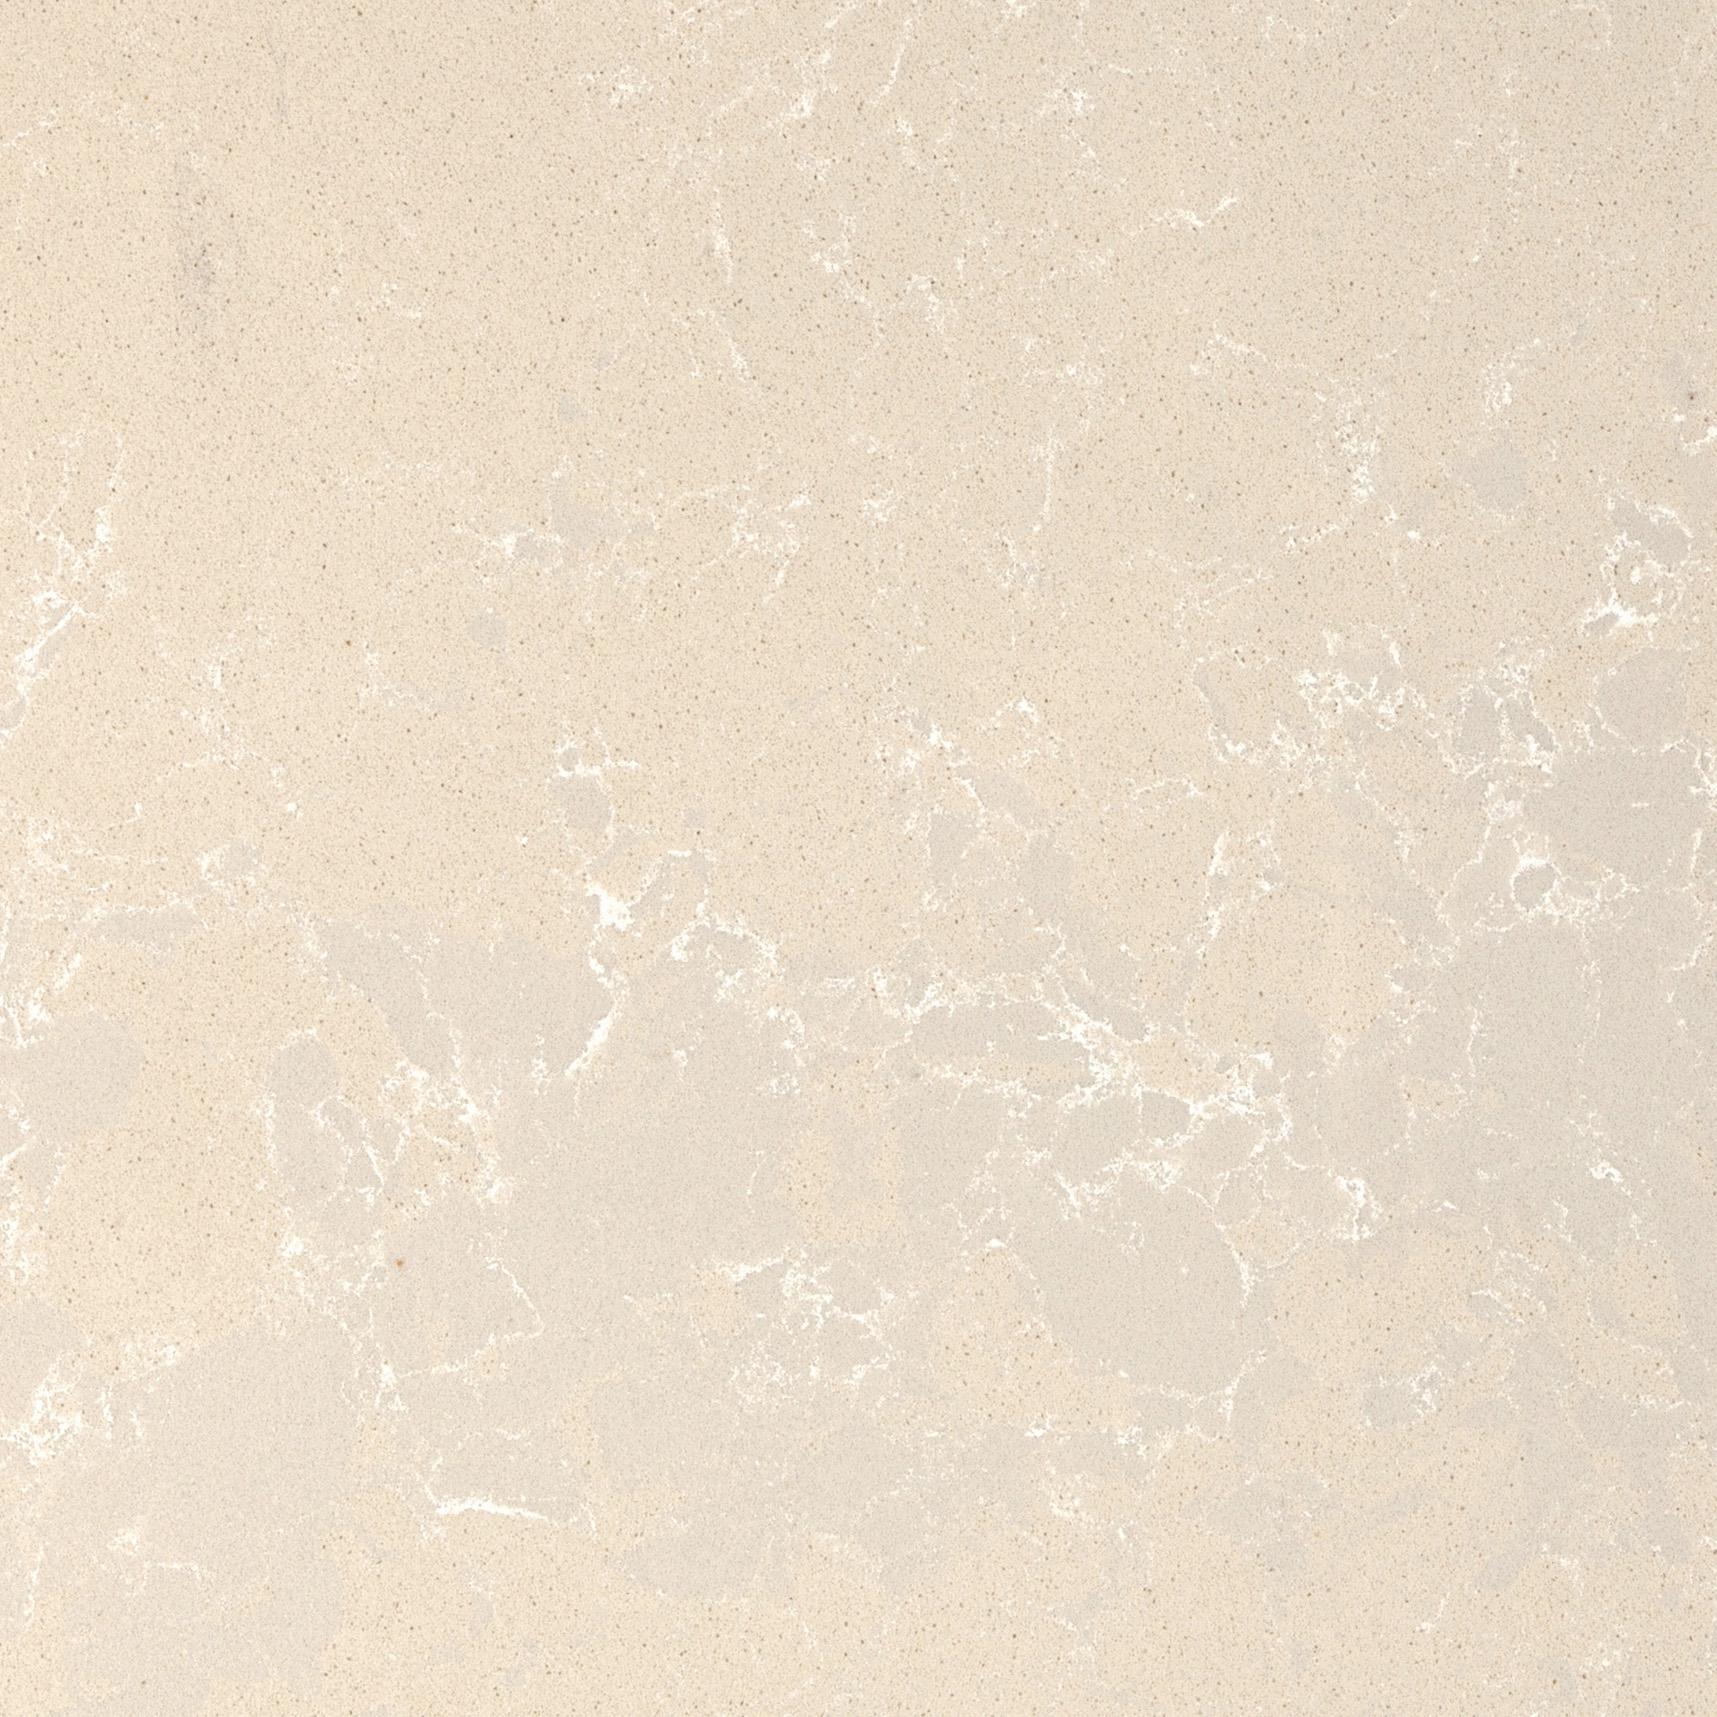 Plan de travail granit noir zimbabwe satin gironde 33 hm d co for Plan de travail granit zimbabwe